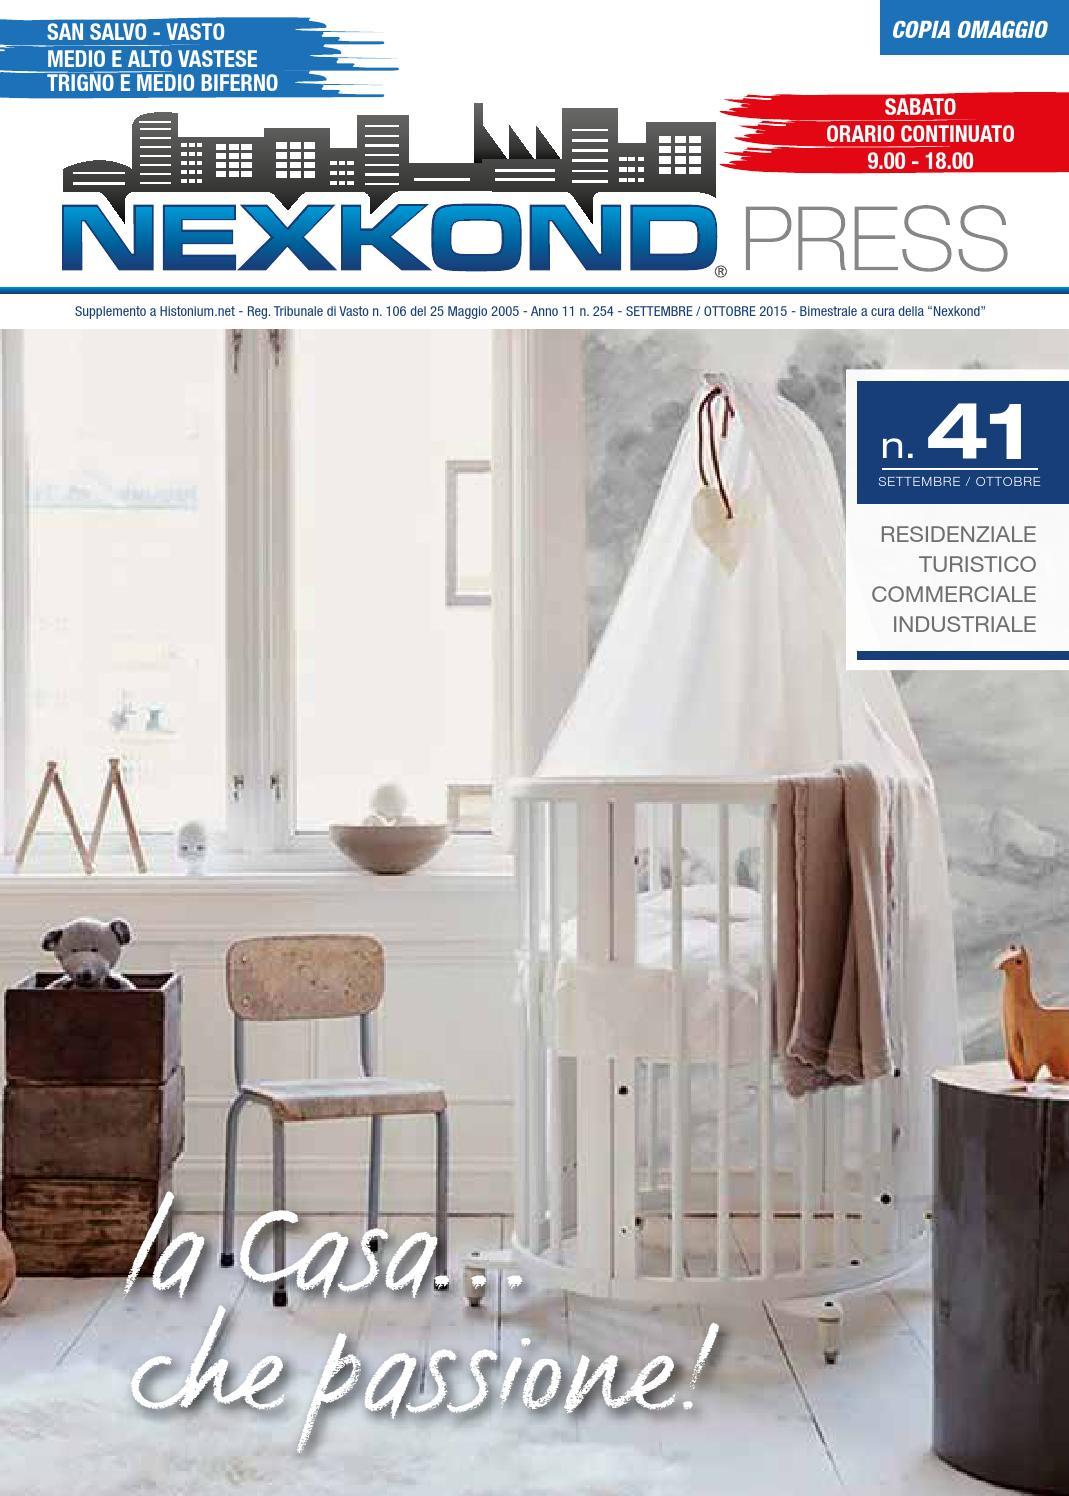 41 Nexkond By Alessandro Cimino Issuu